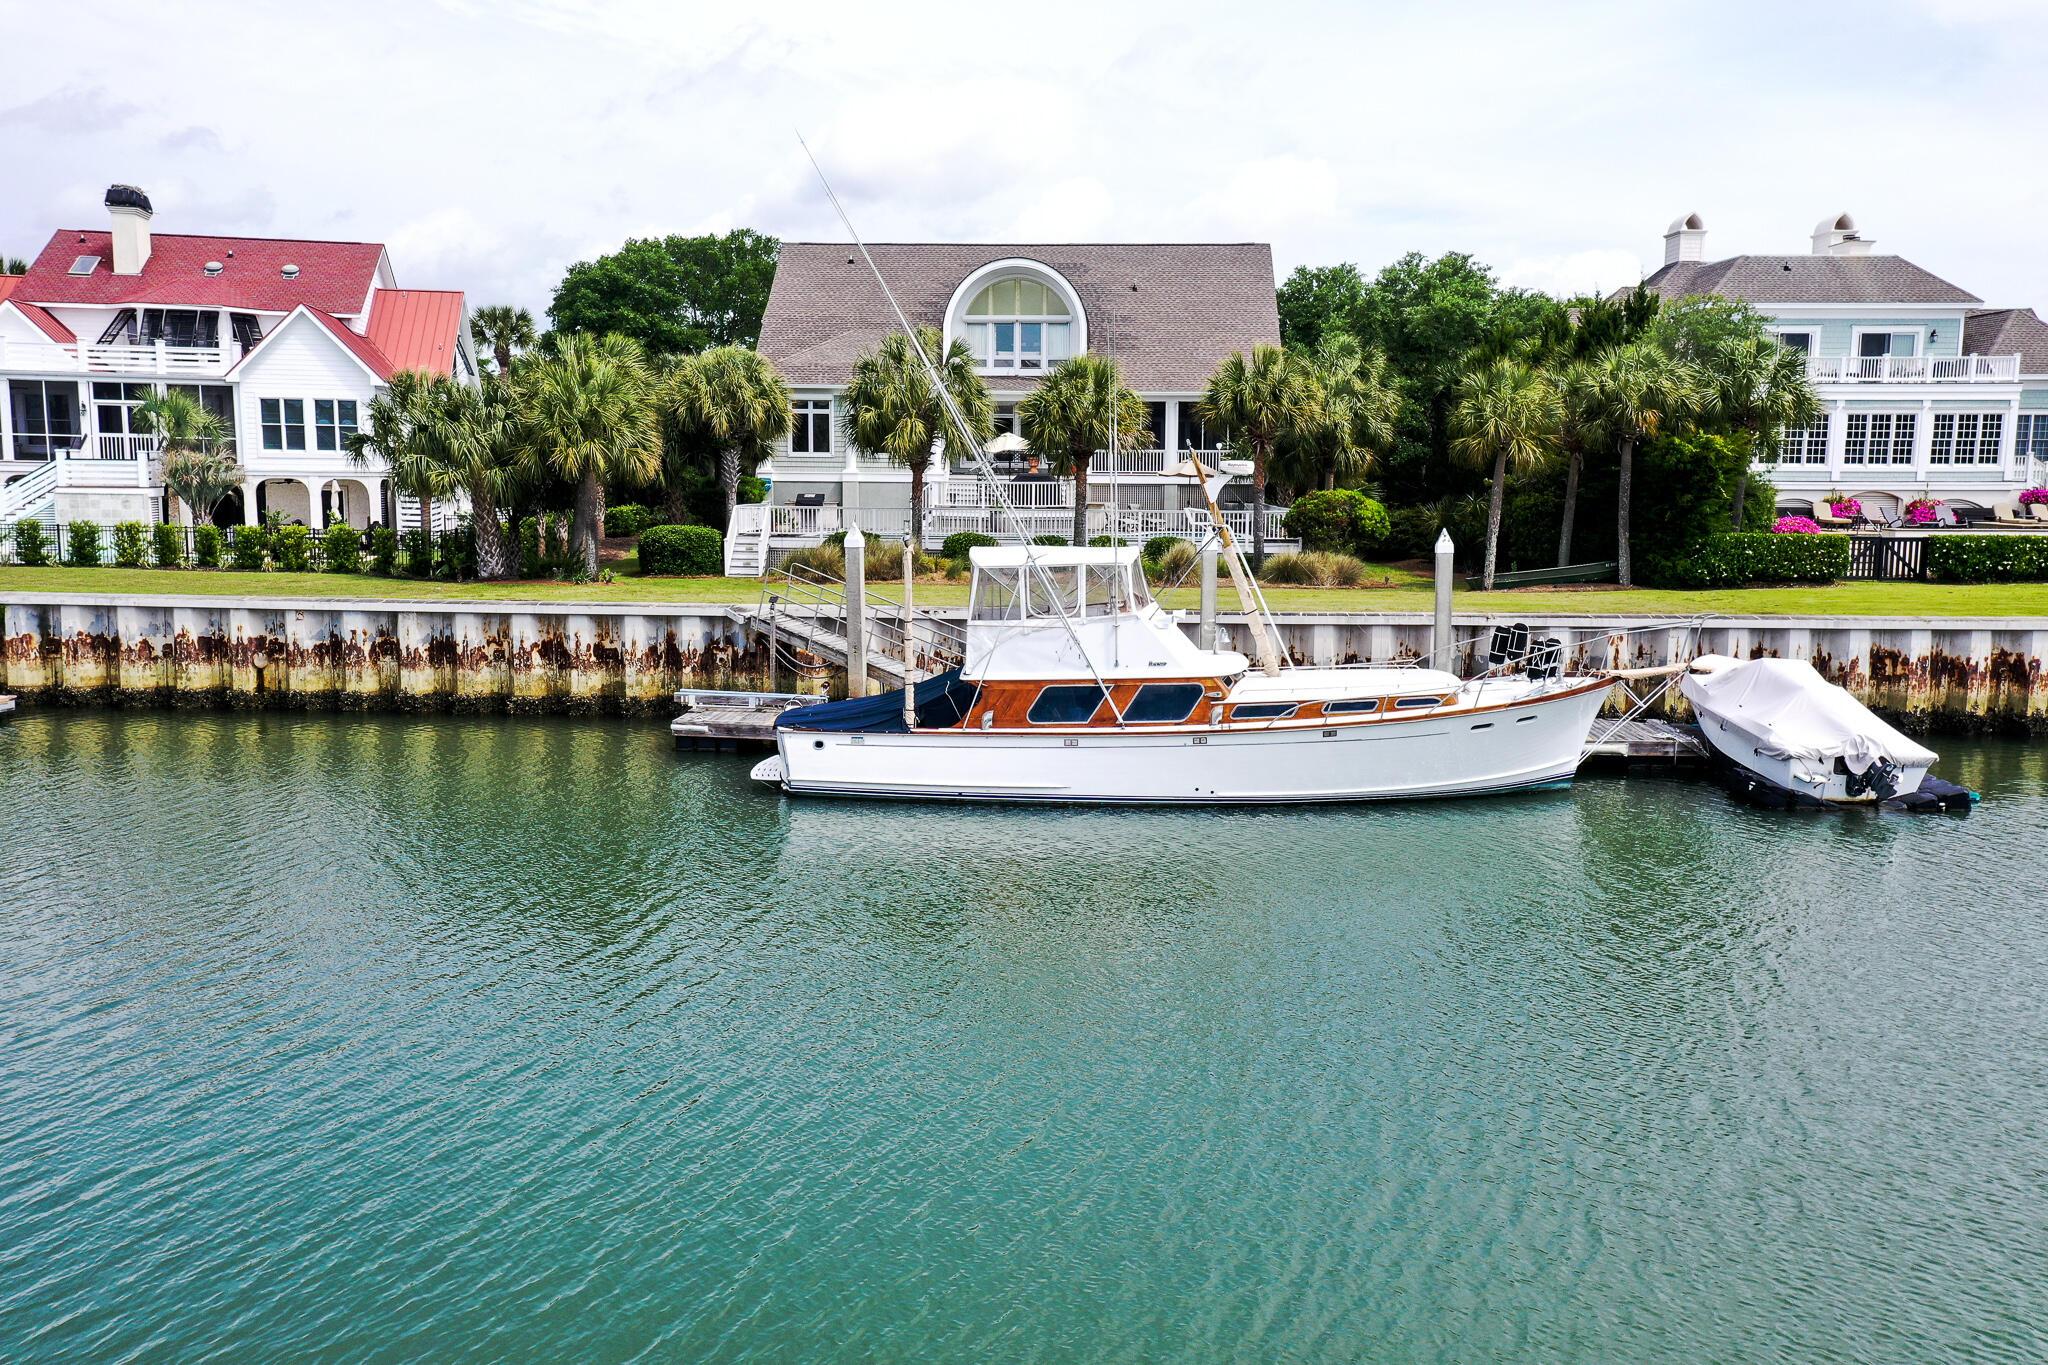 Waterway Island Homes For Sale - 42 Waterway Island Drive, Isle of Palms, SC - 46